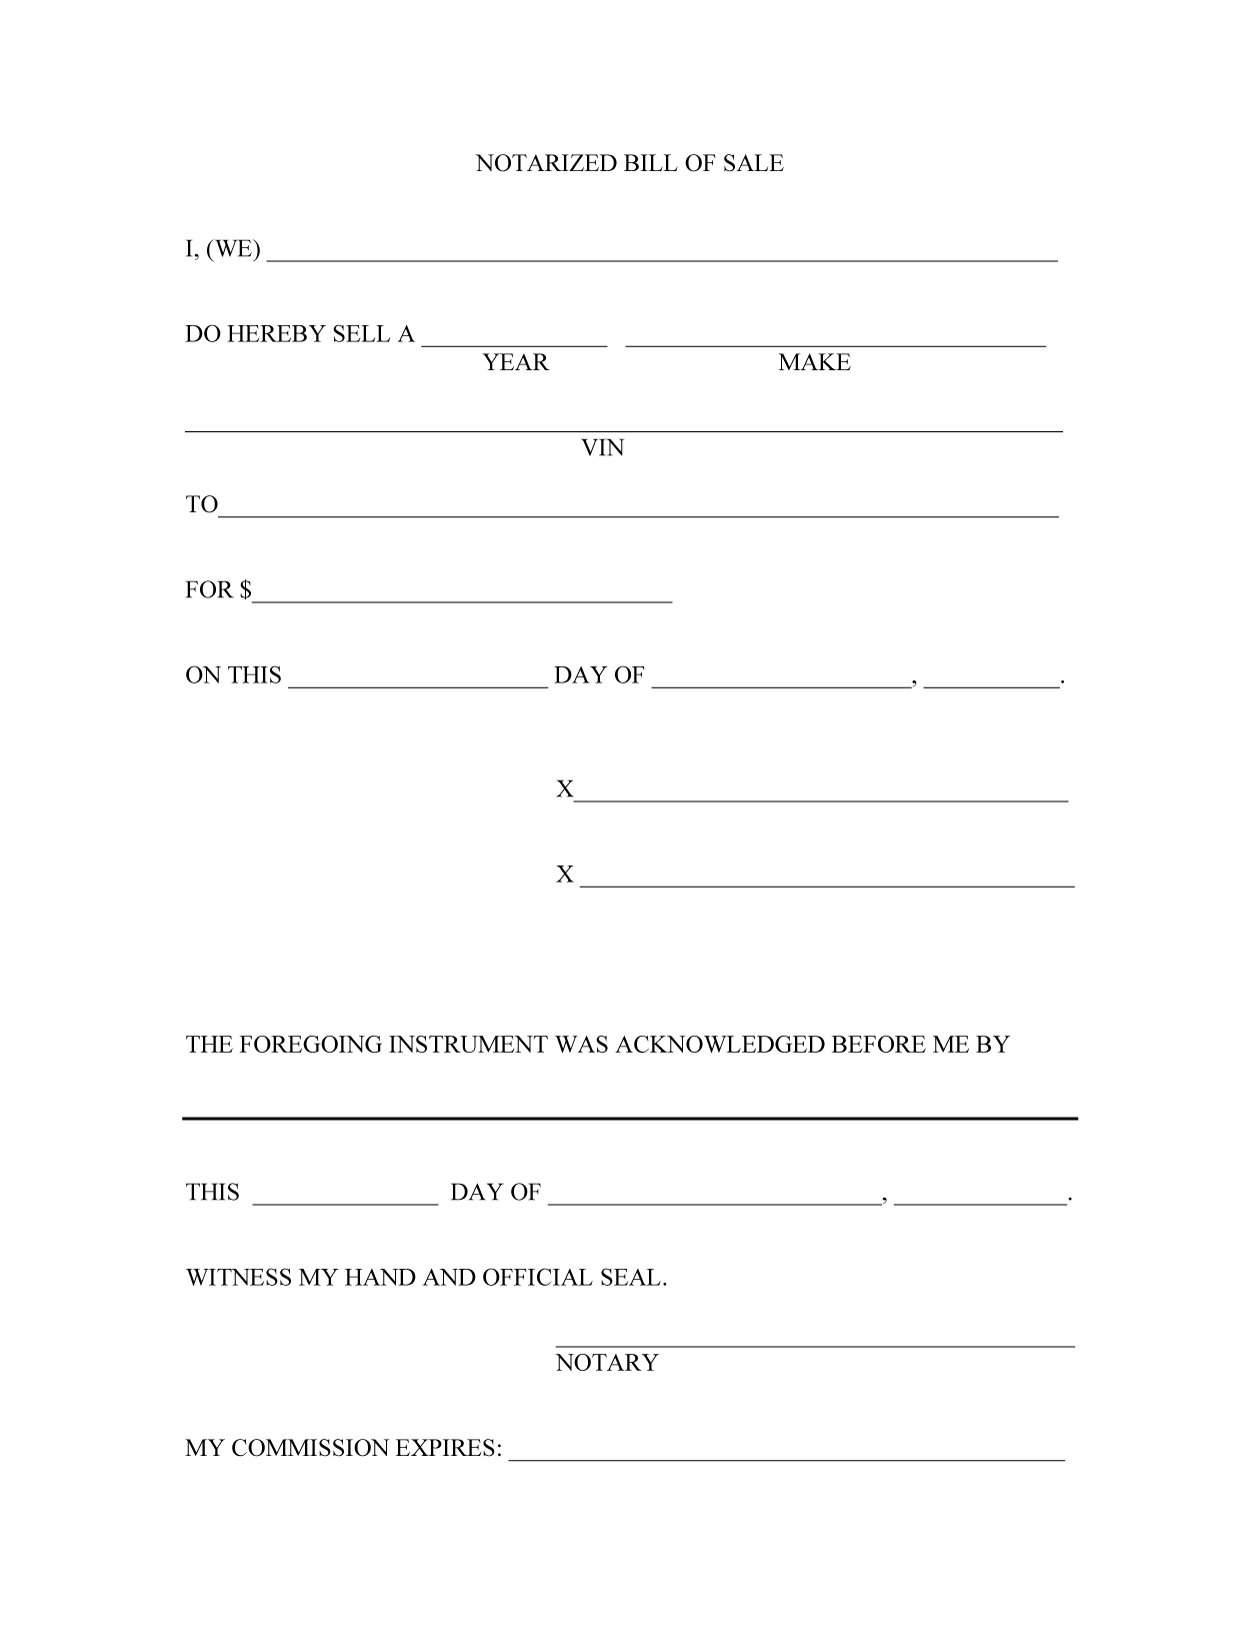 45+ Fee Printable Bill of Sale Templates (Car, Boat, Gun, Vehicle